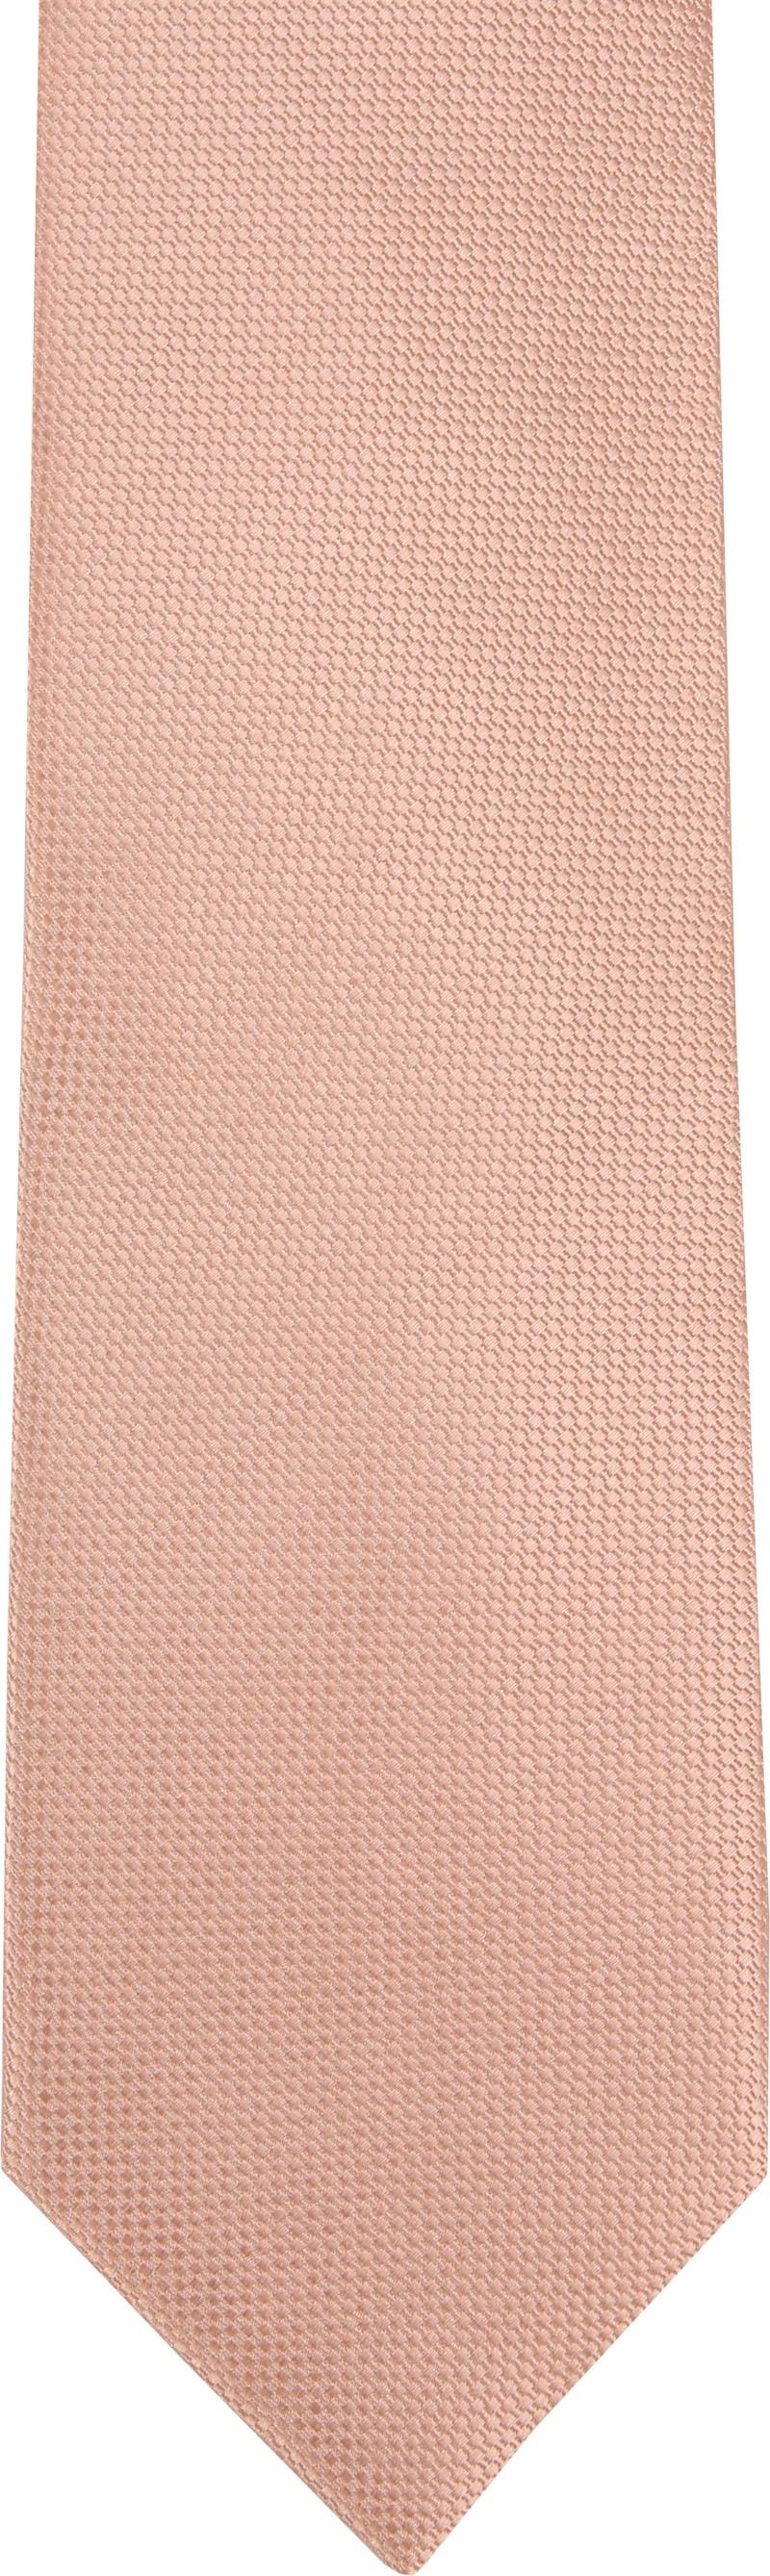 Suitable Tie Silk Pink 16 photo 1